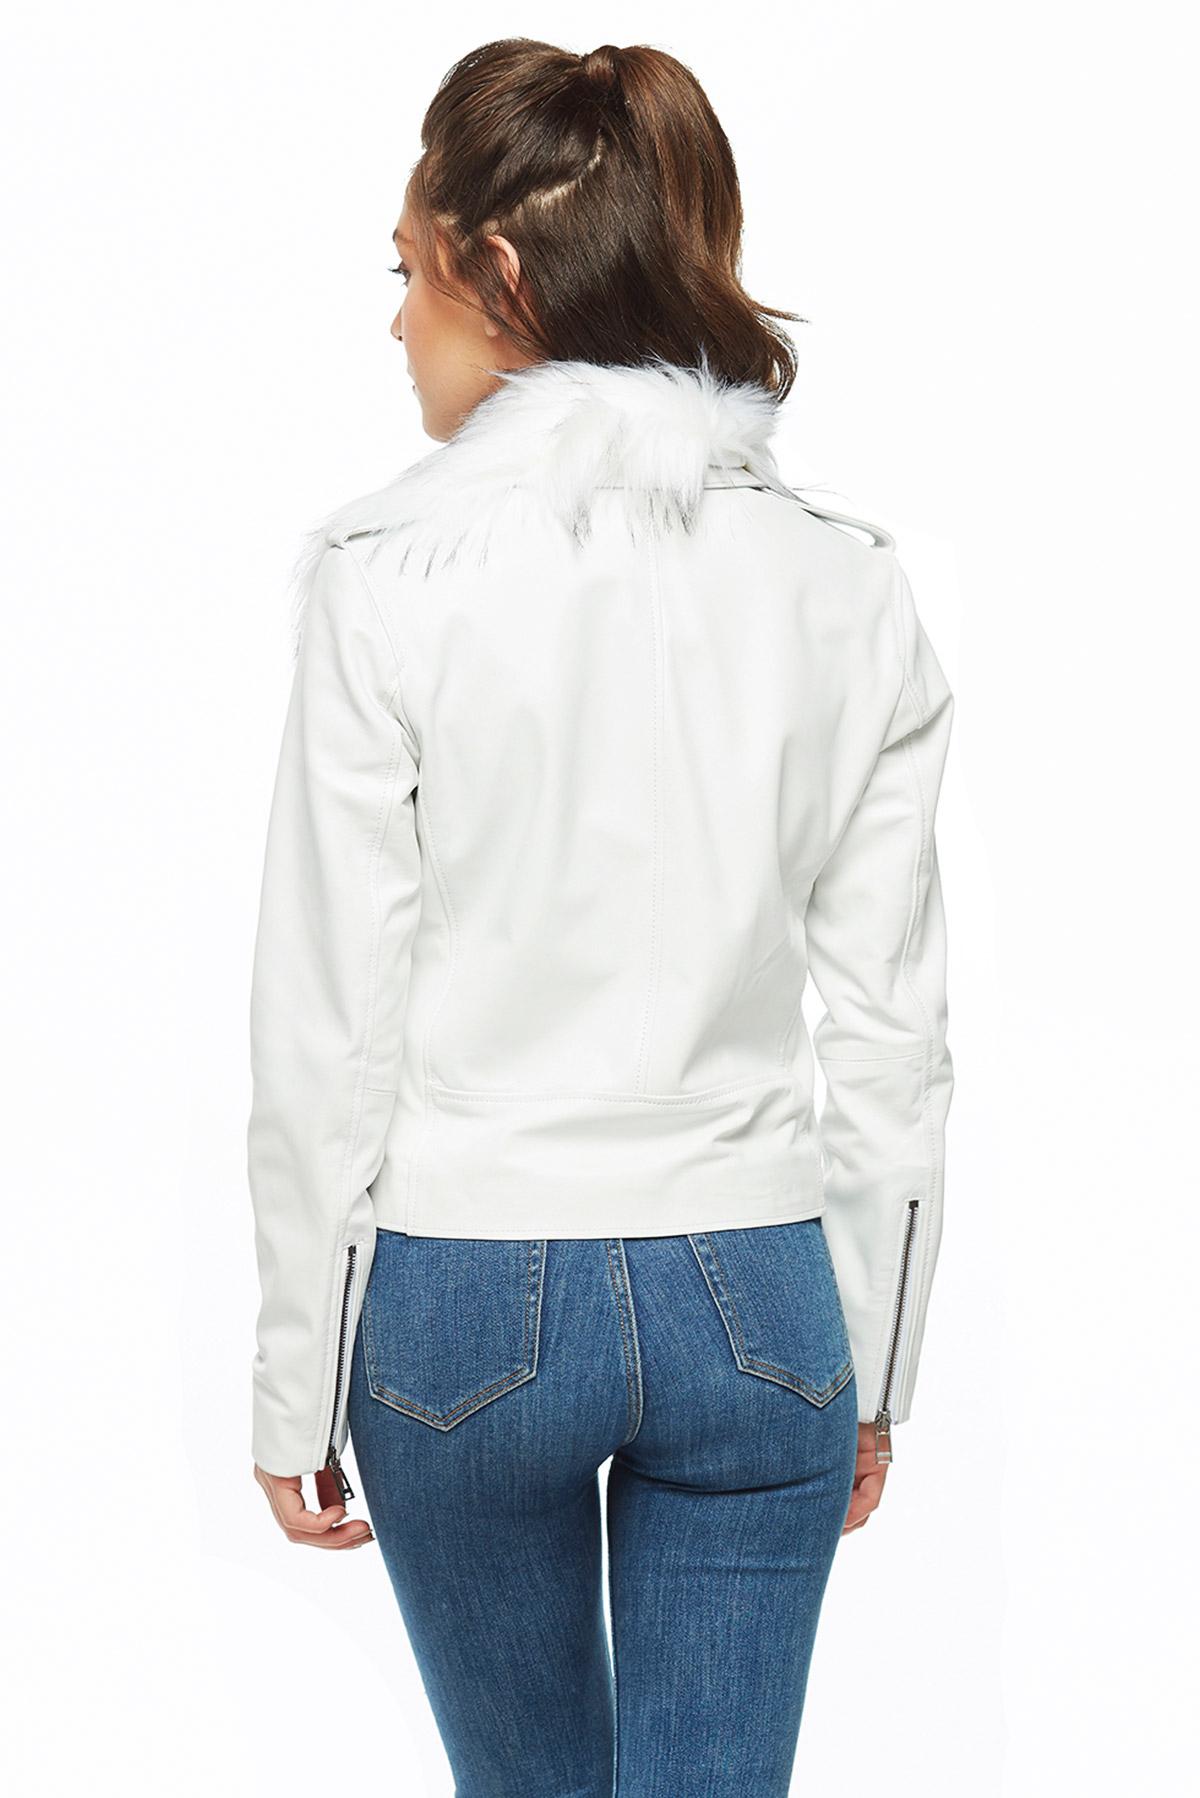 genuine leather jacket price